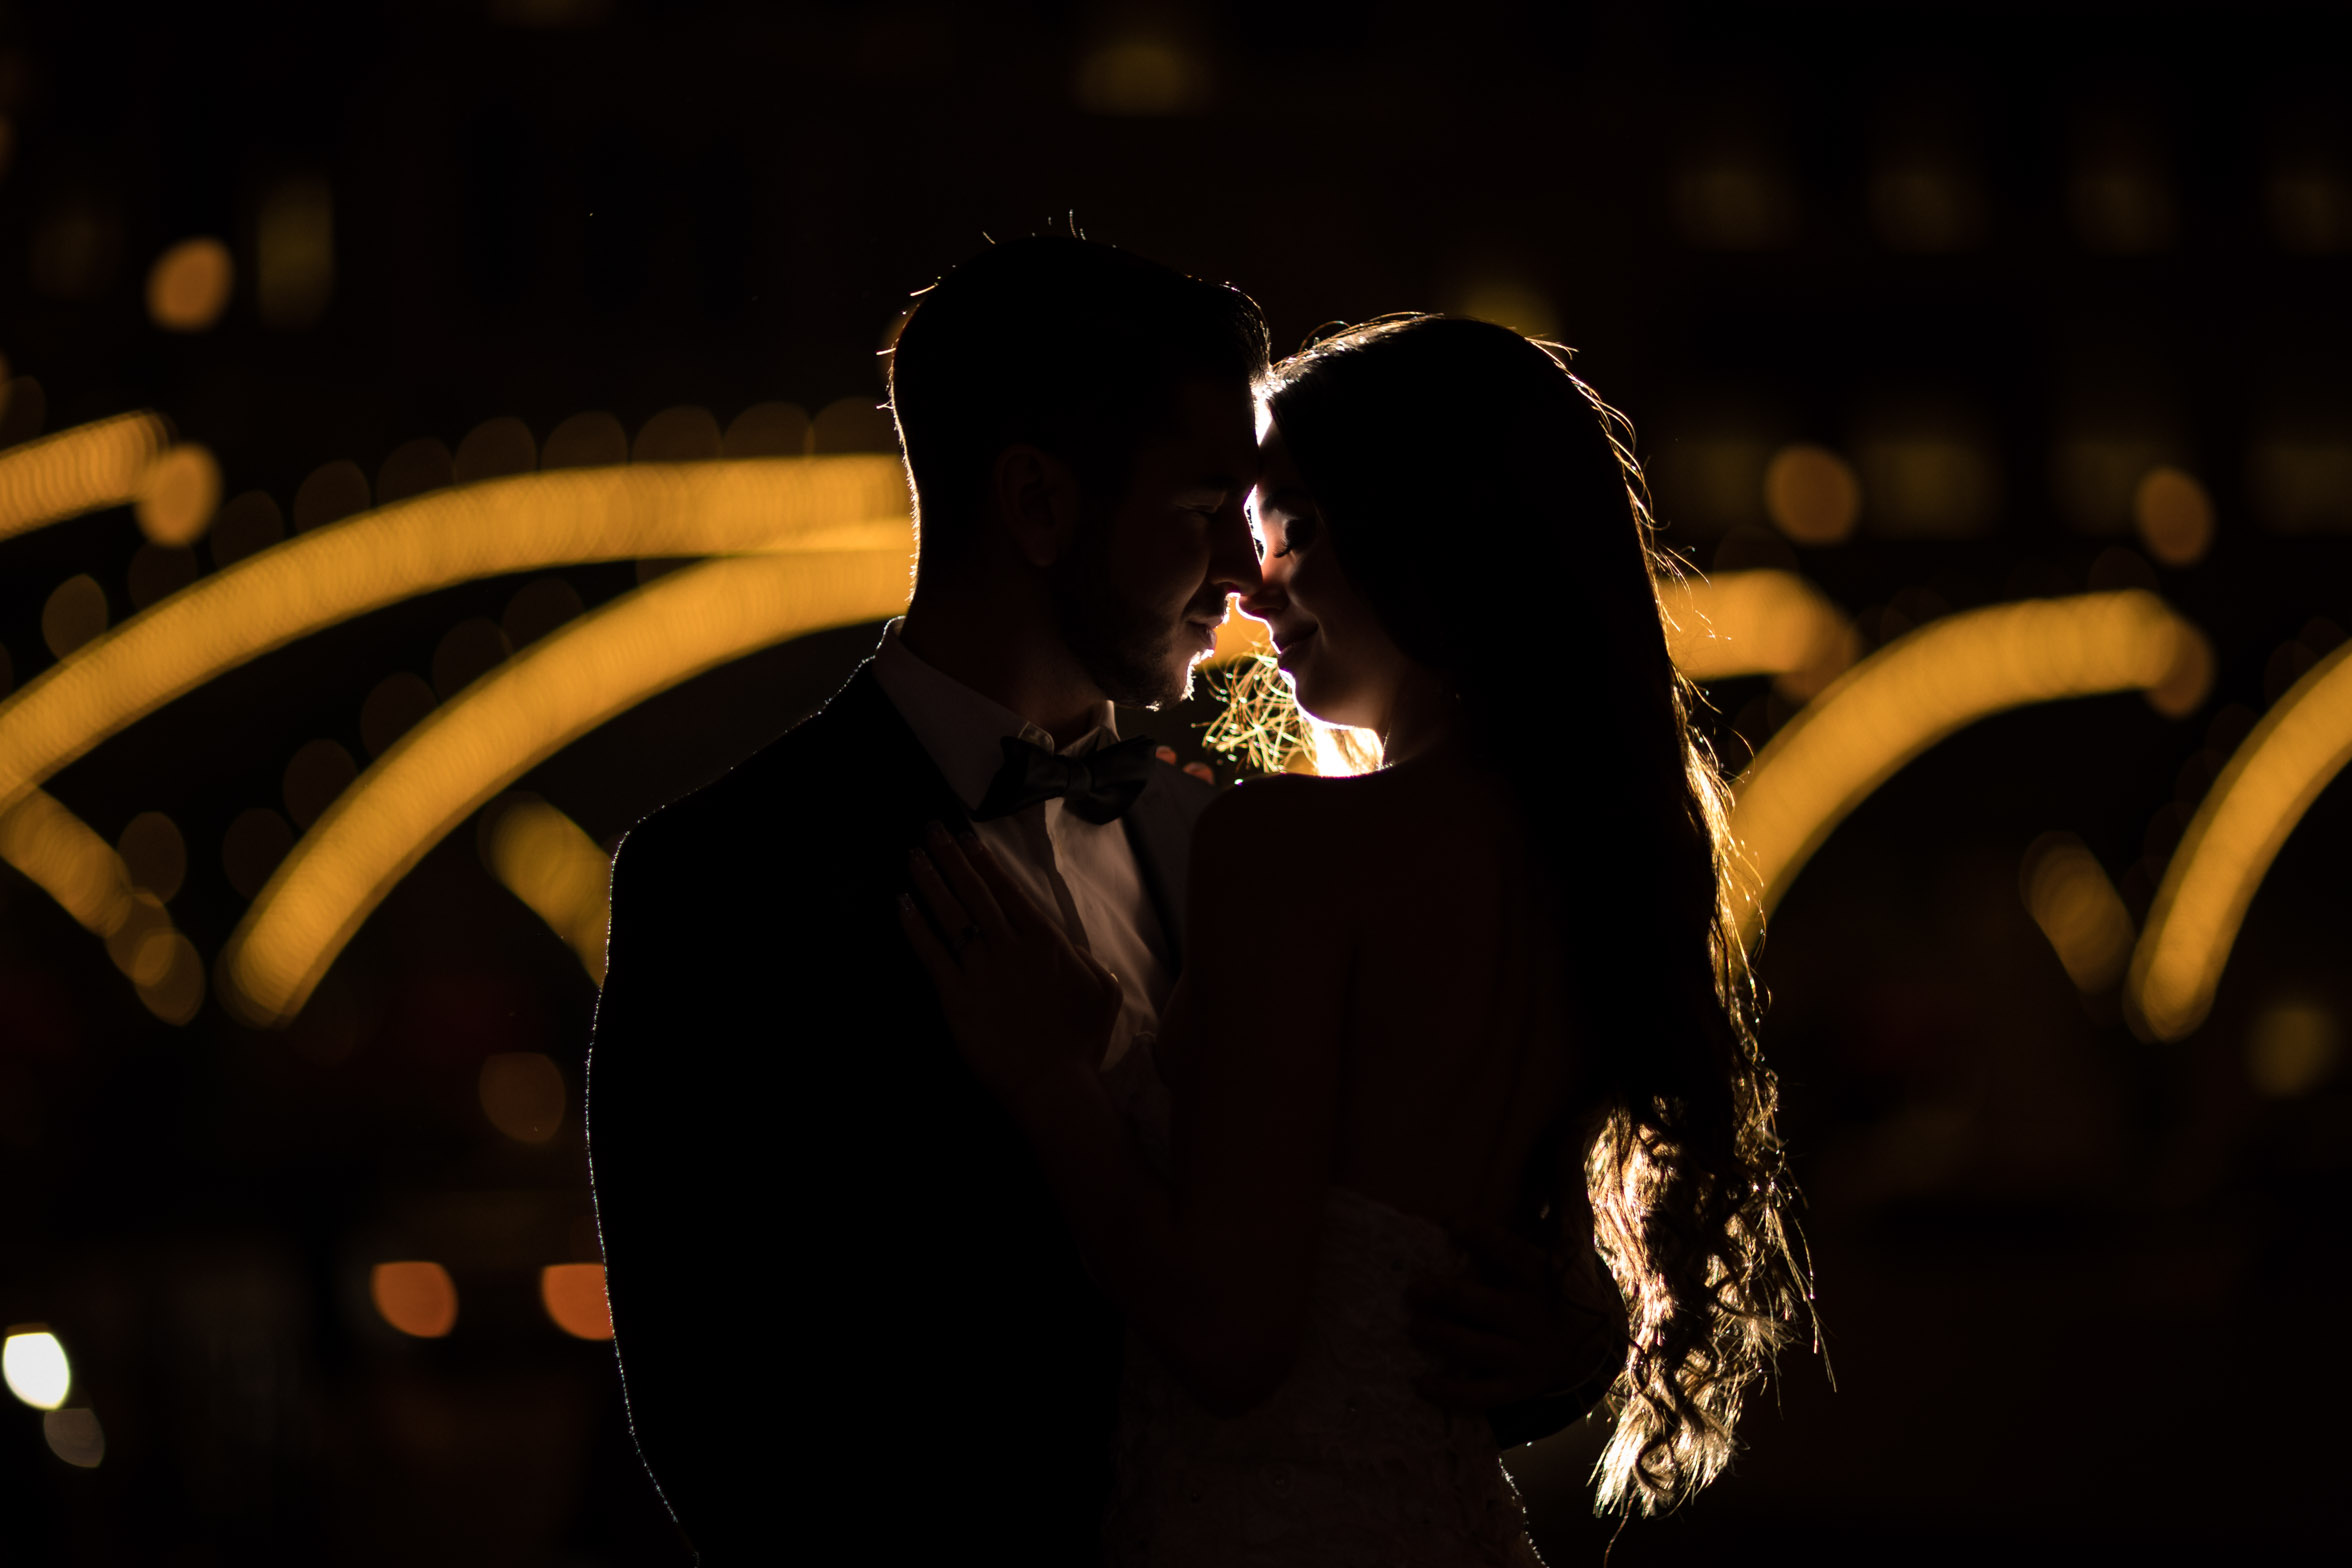 couple-seance-photo.jpg